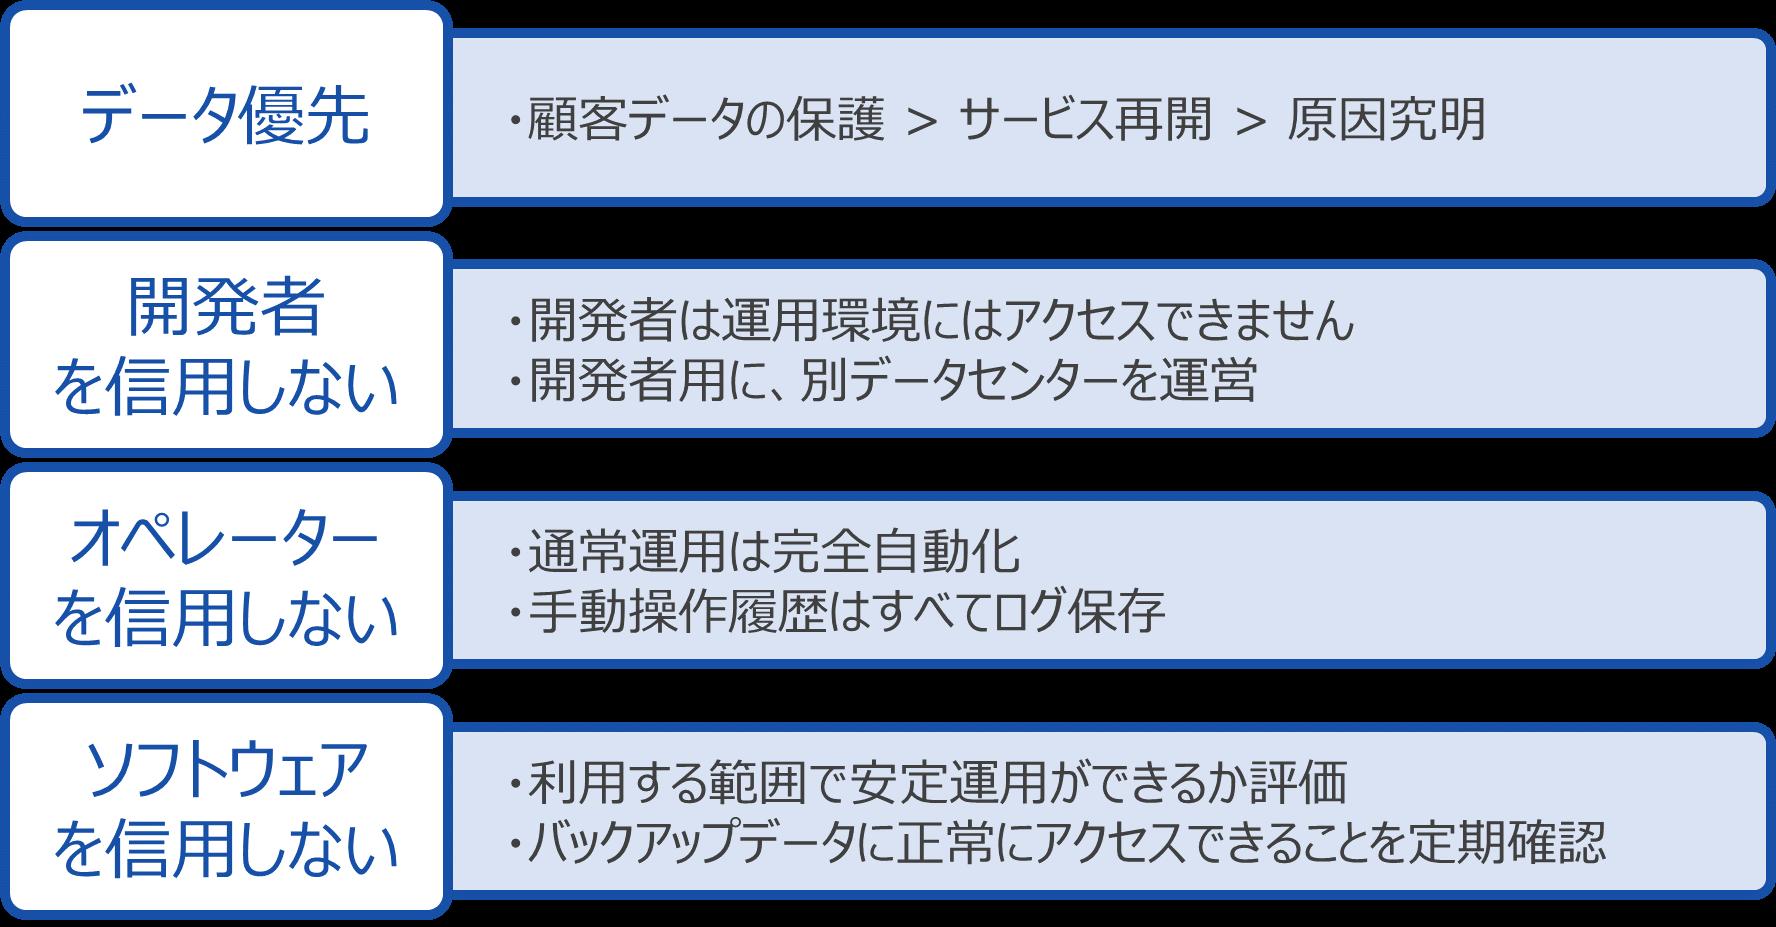 https://enterprise.cybozu.co.jp/images/%E9%81%8B%E7%94%A8%E3%81%AE%E5%8E%9F%E5%89%87.png